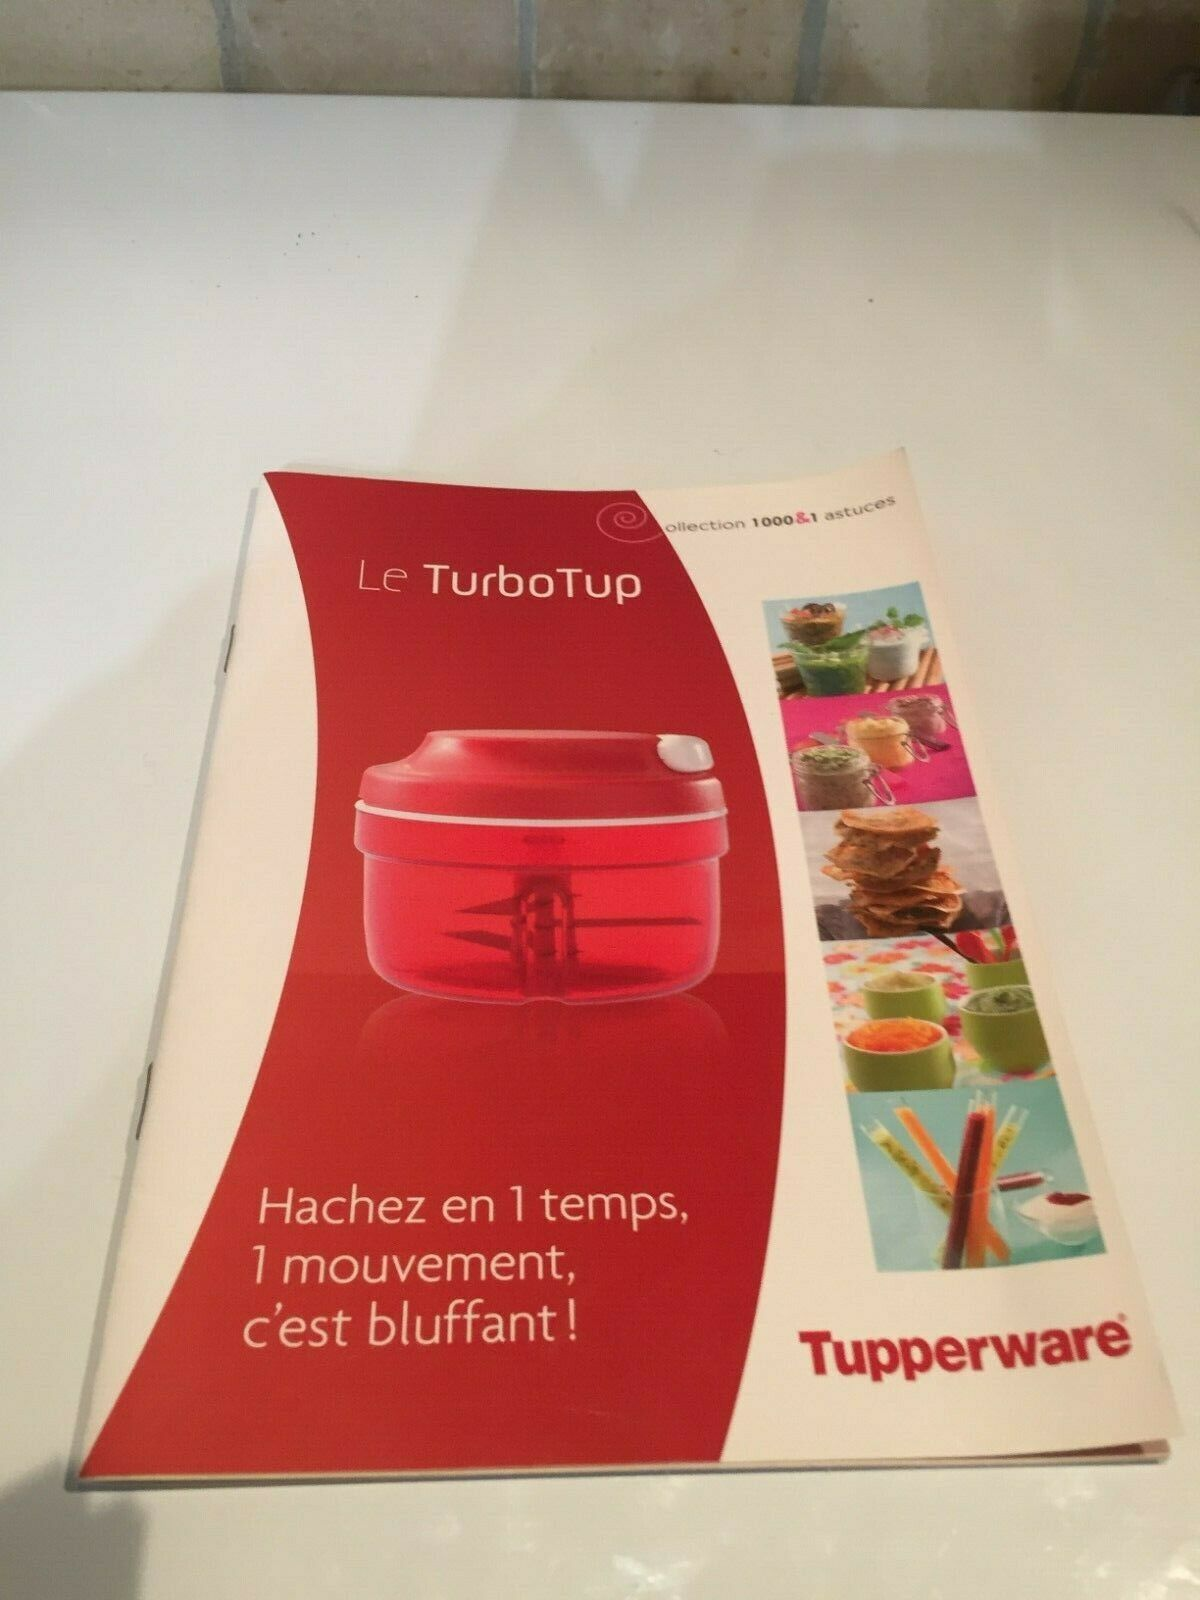 Livret tupperware : le turbotup